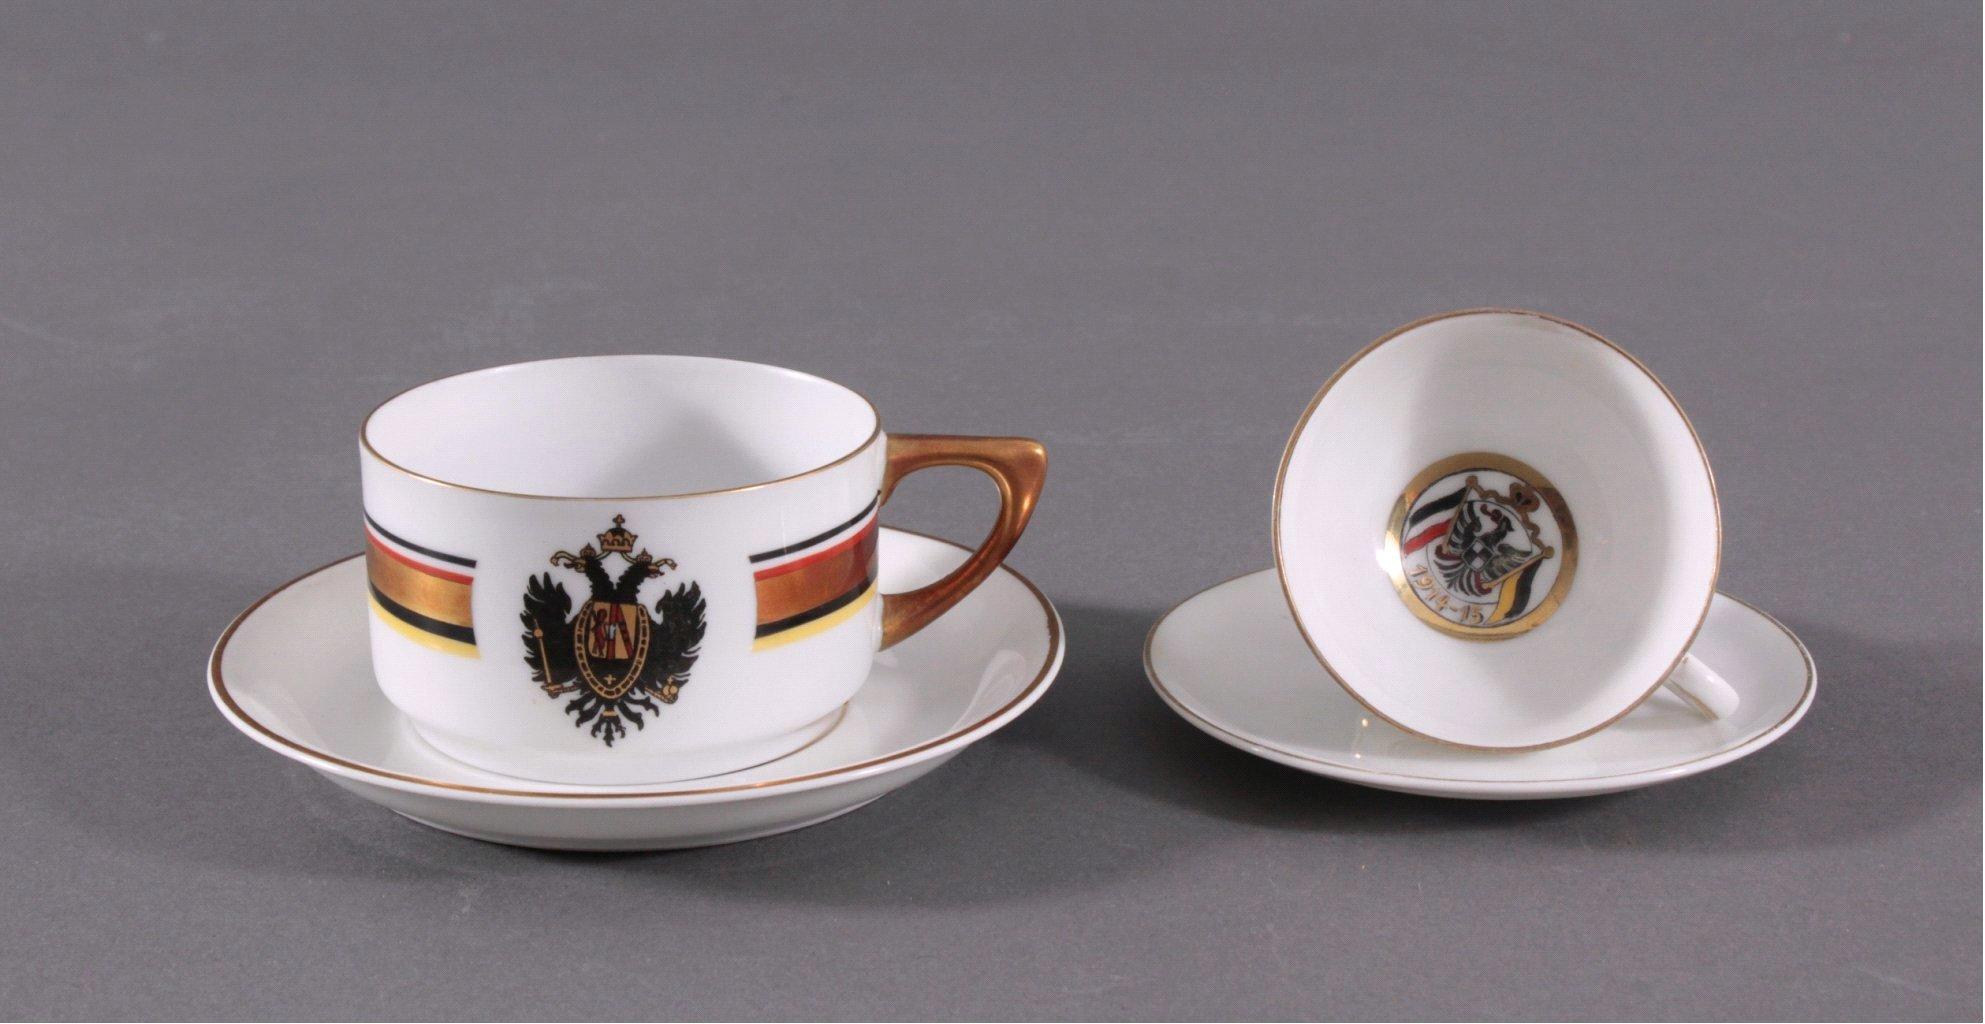 Heraldische Wappentassen um 1910/20